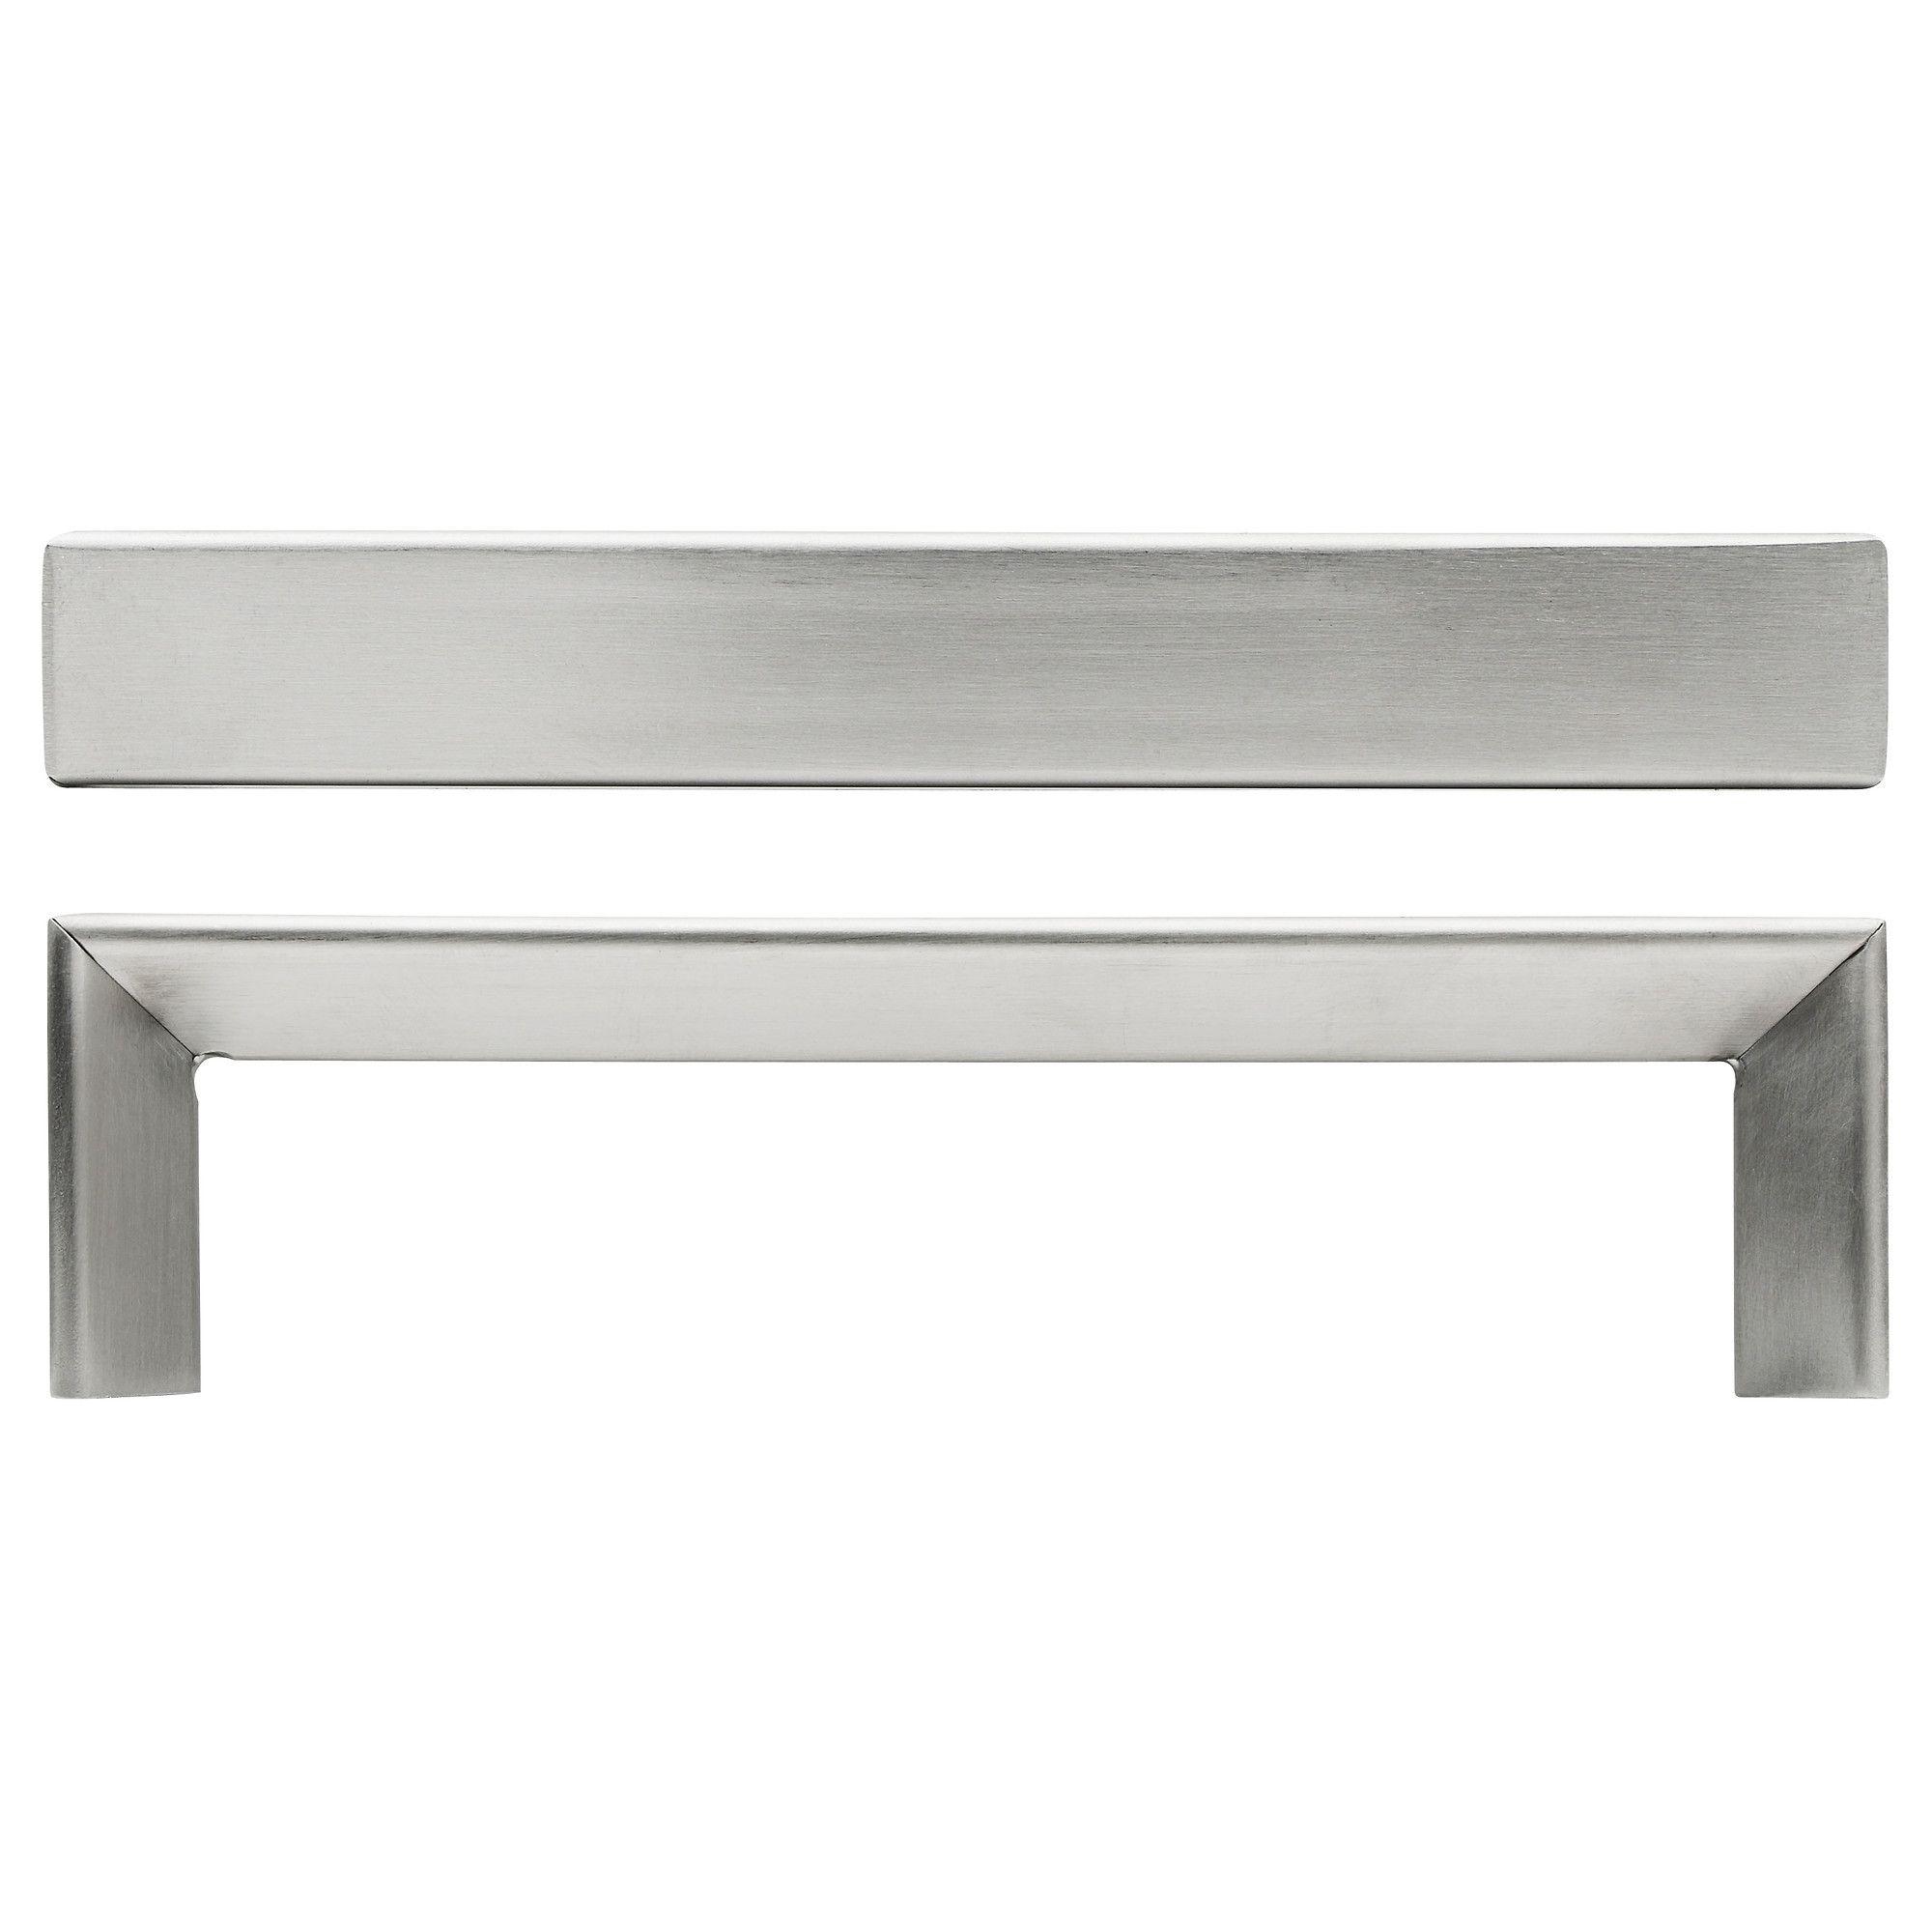 "Ikea Kitchen Cabinet Hardware: 13 "" $12.99 Also 6"" Match Handles On Ikea"